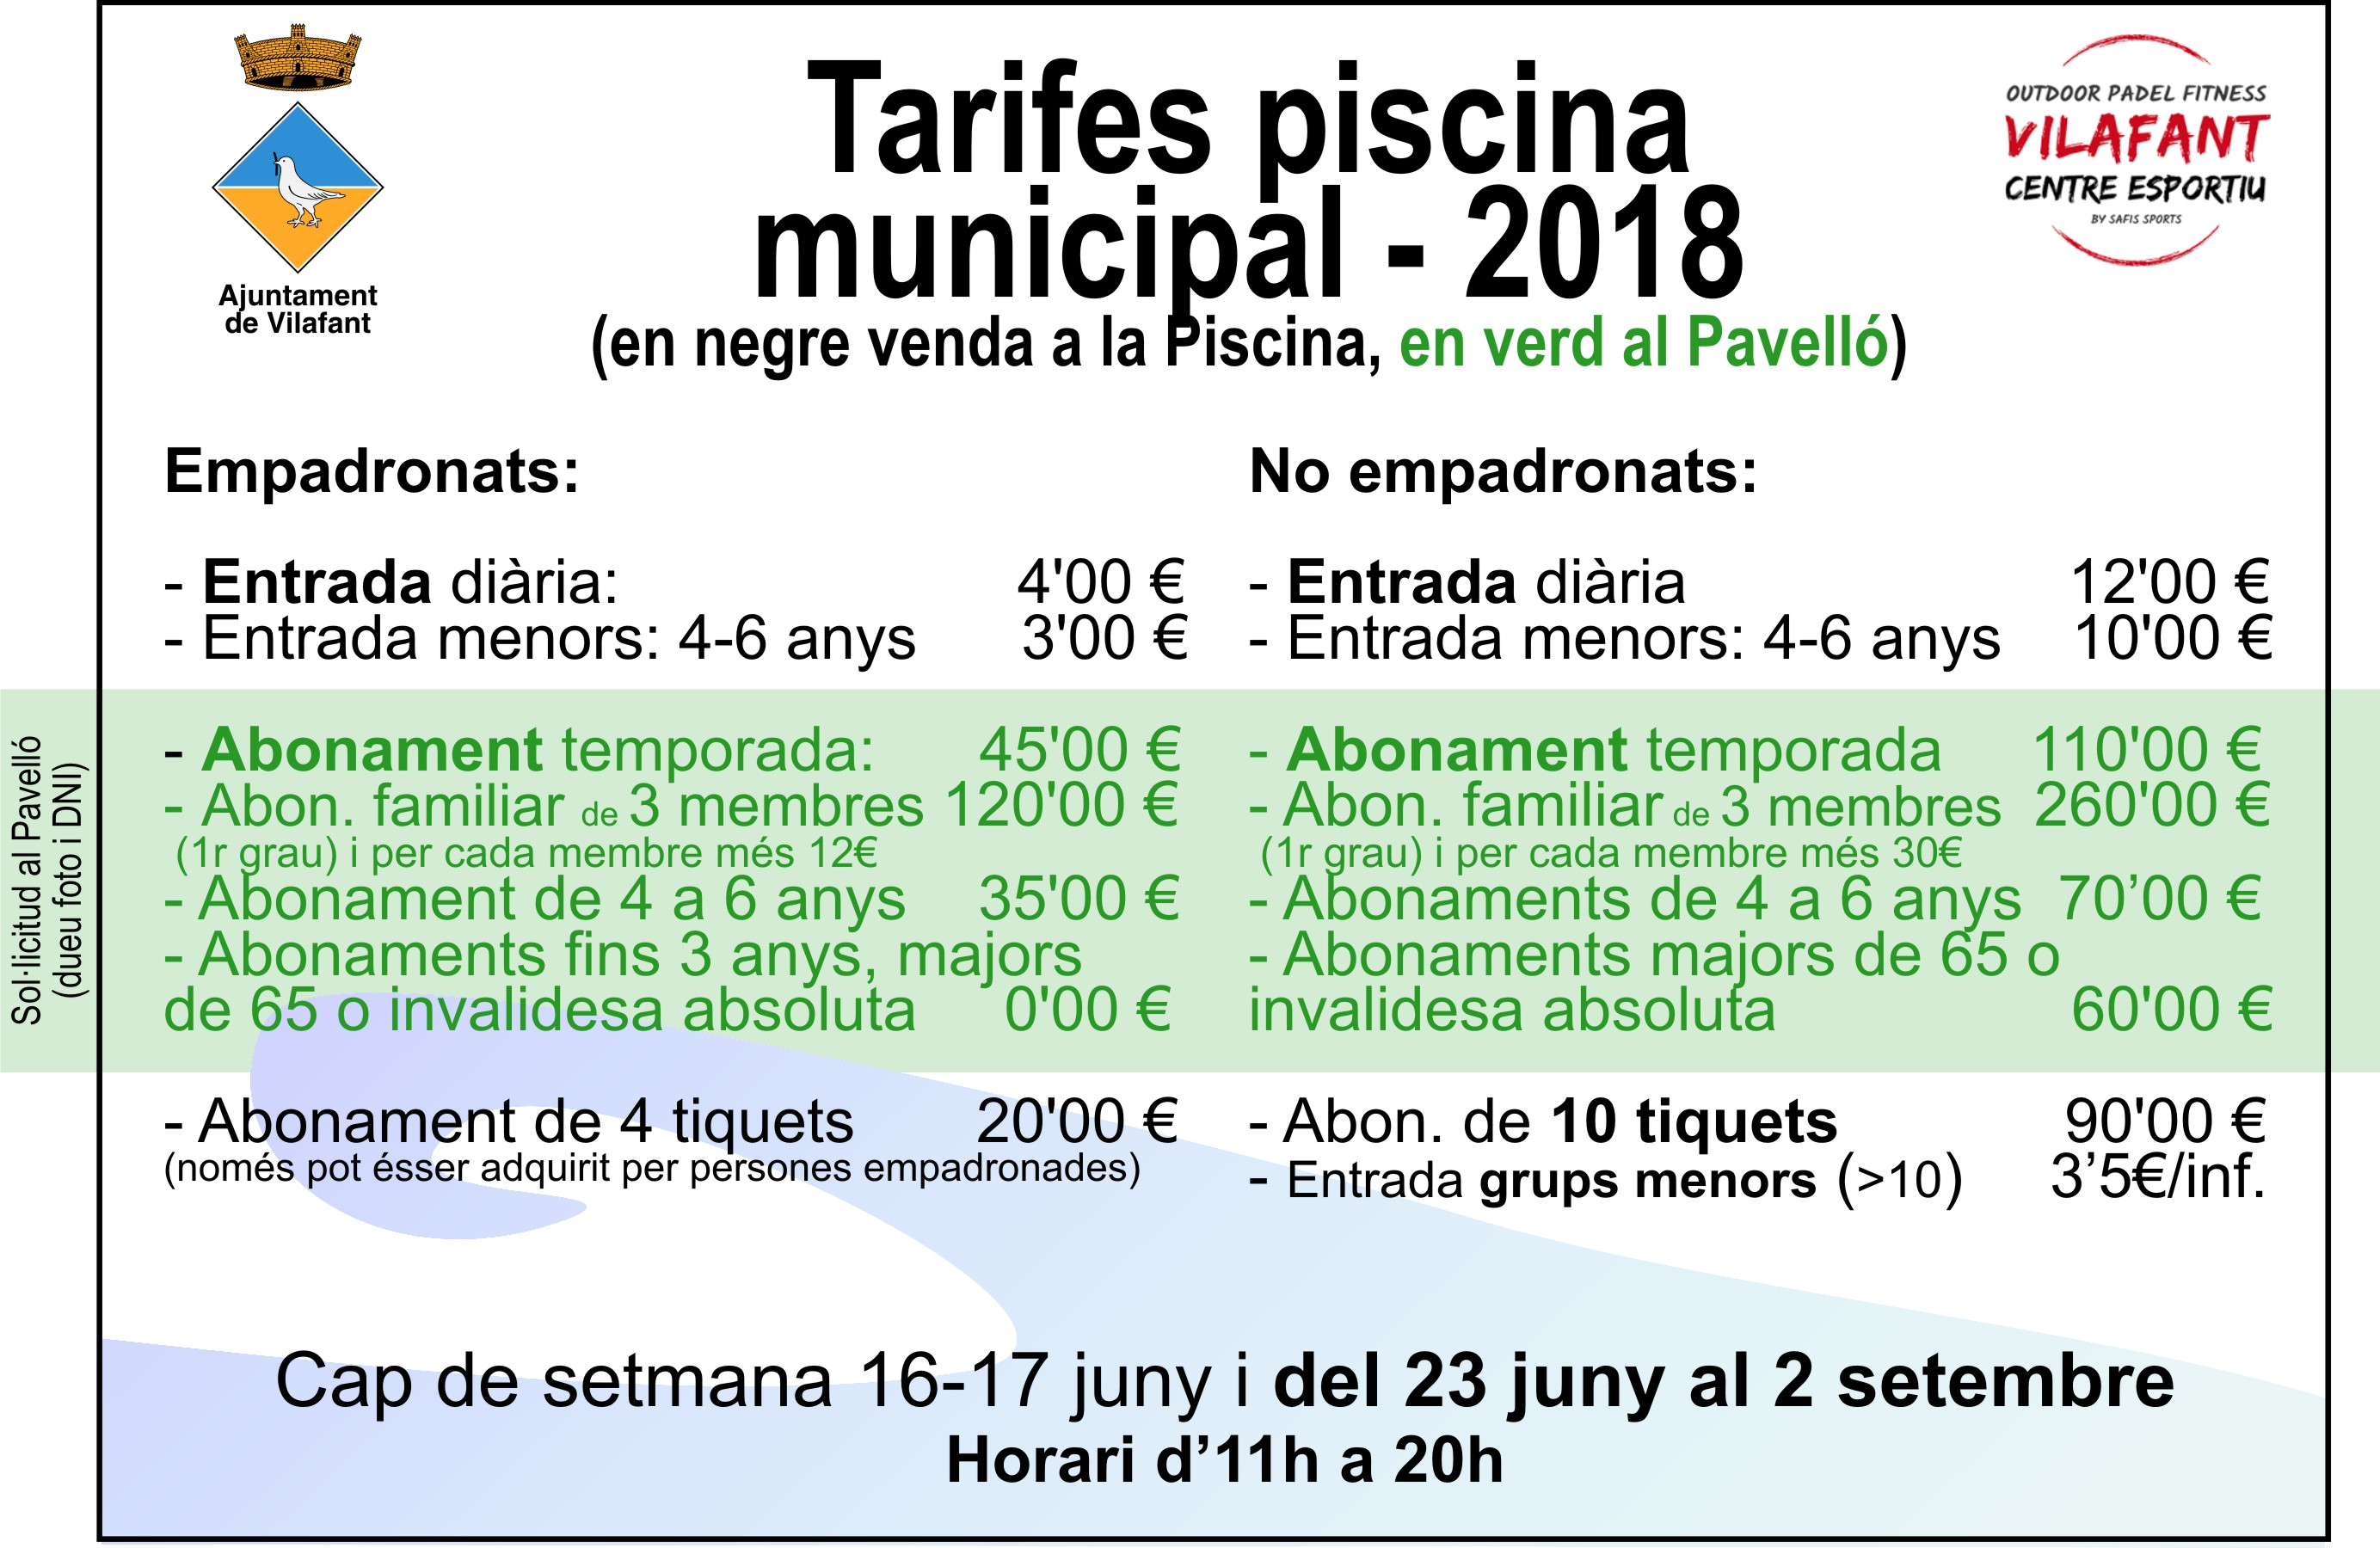 Tarifa Piscina Municipal de Vilafant 2018